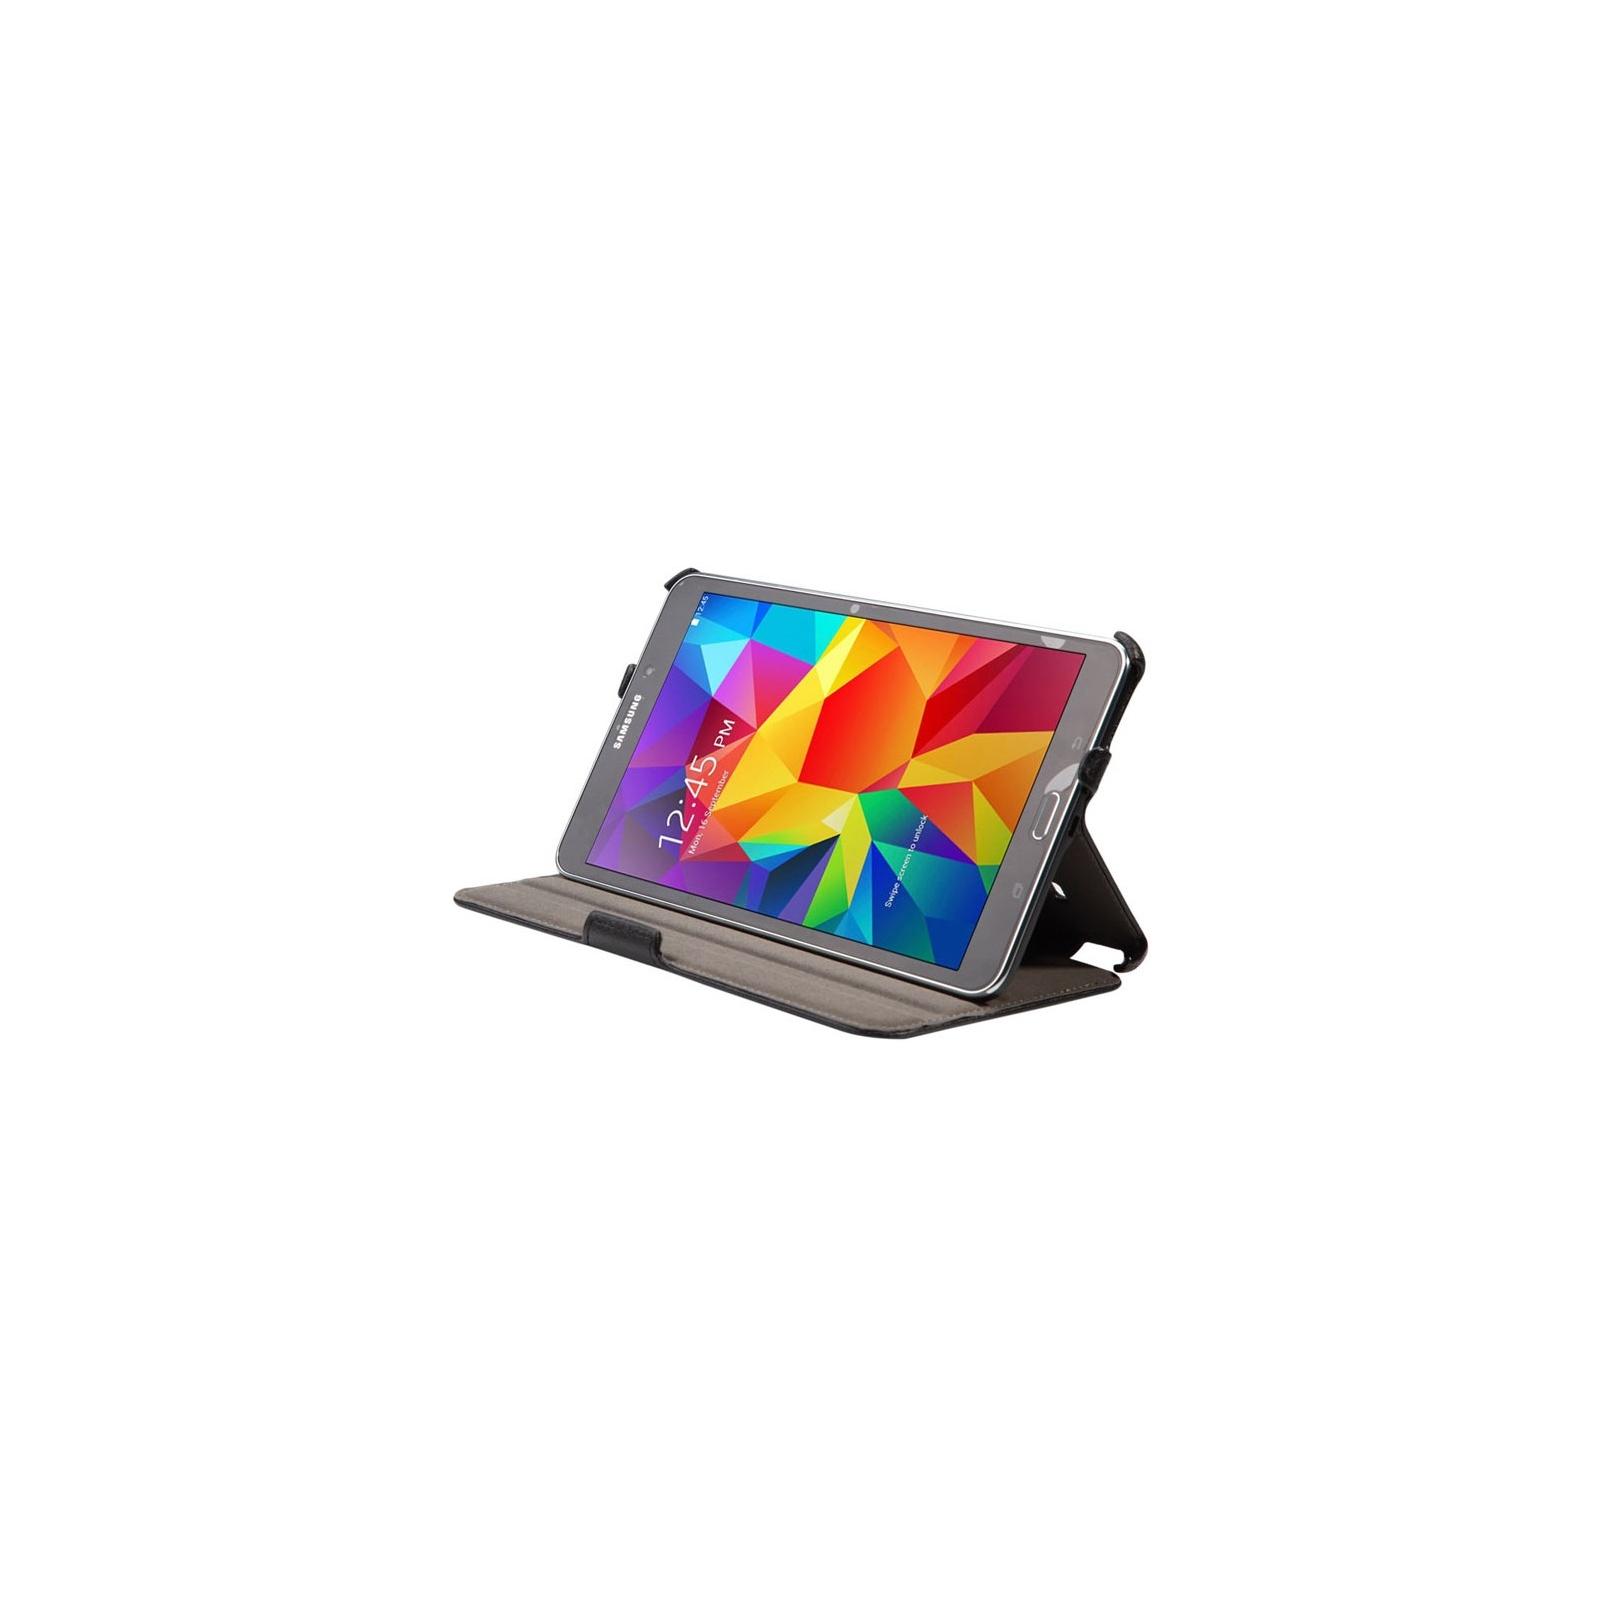 Чехол для планшета AirOn для Samsung GALAXY Tab 4 8.0 black (6946795850168) изображение 5